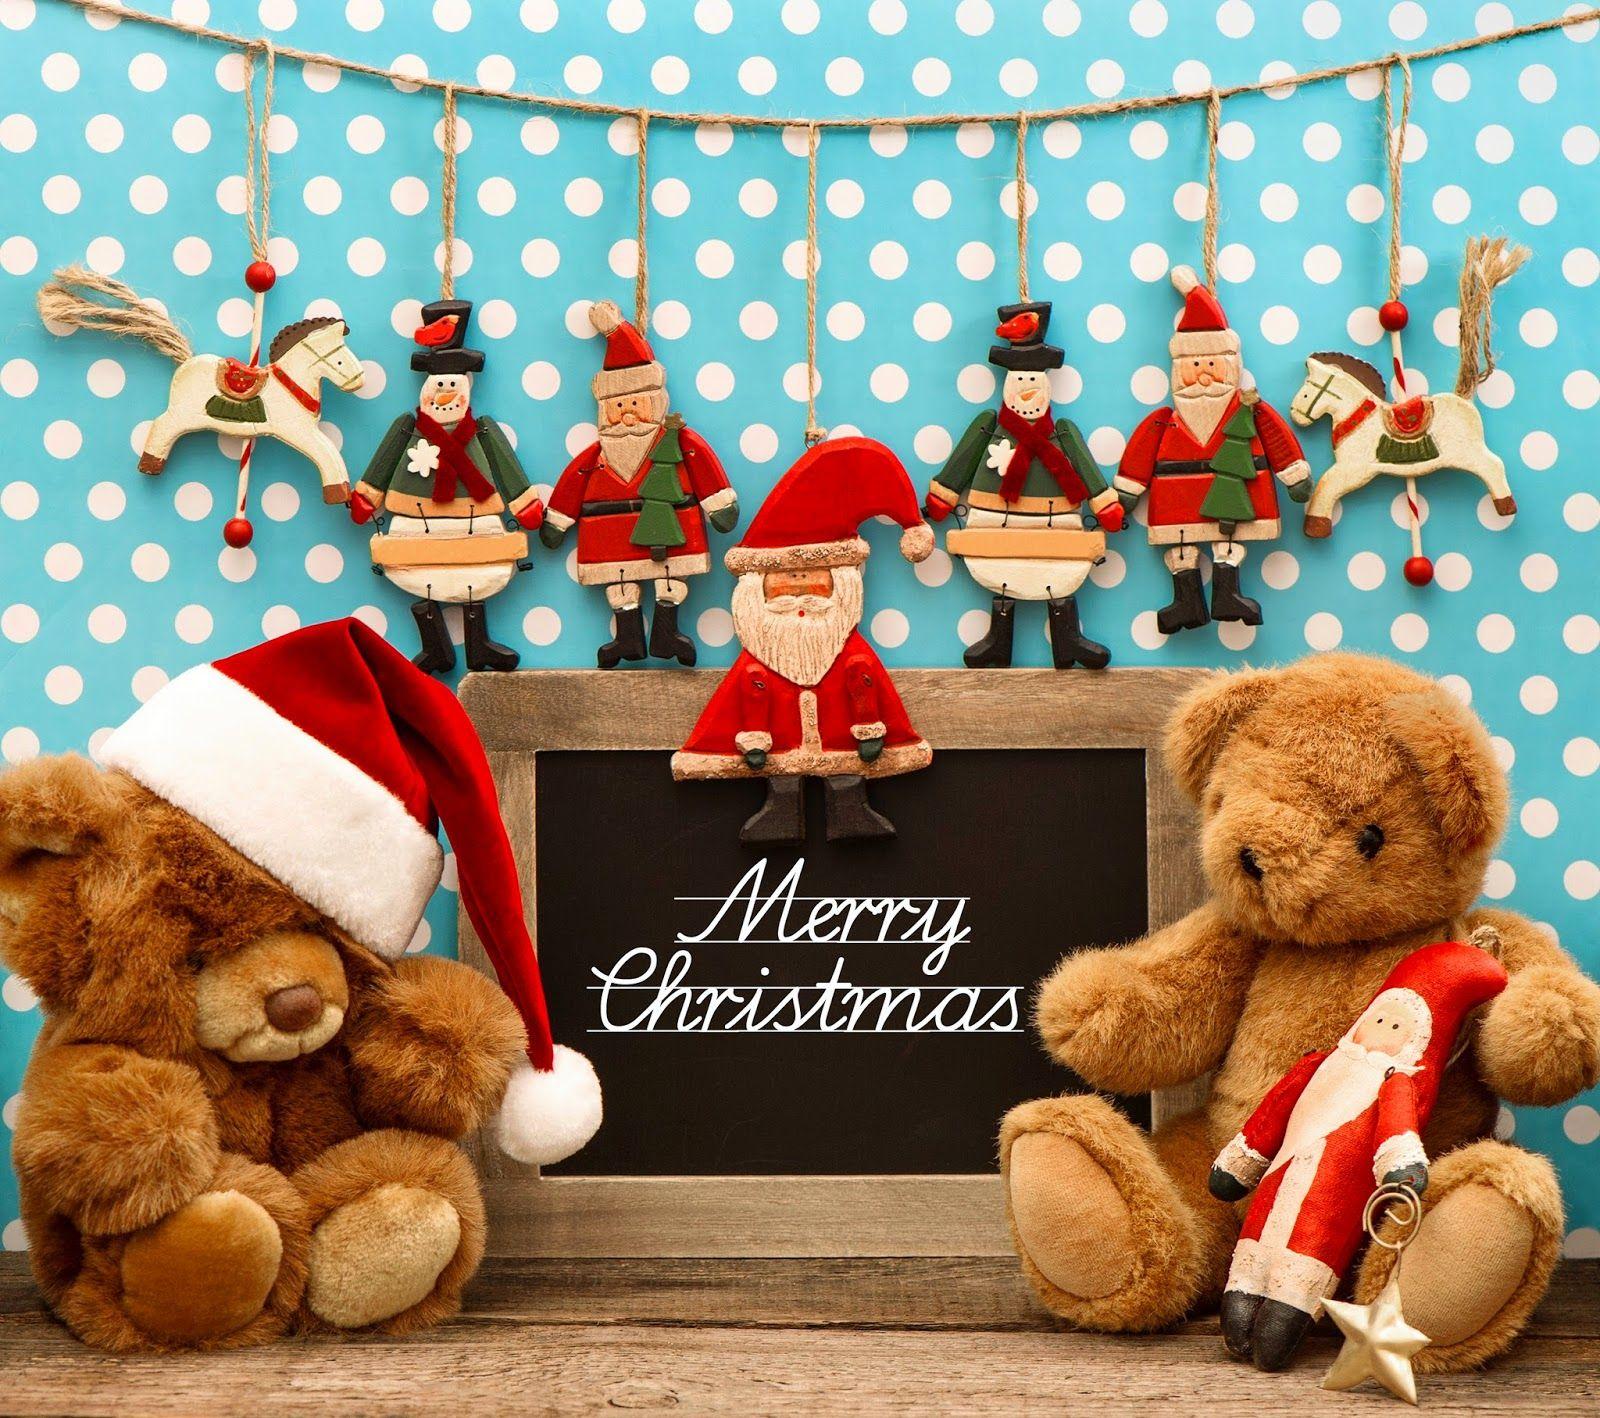 Cute Merry Christmas Background Full Hd 1080p Wallpapers Merry Christmas Photos Merry Christmas Card Greetings Merry Christmas Wallpaper